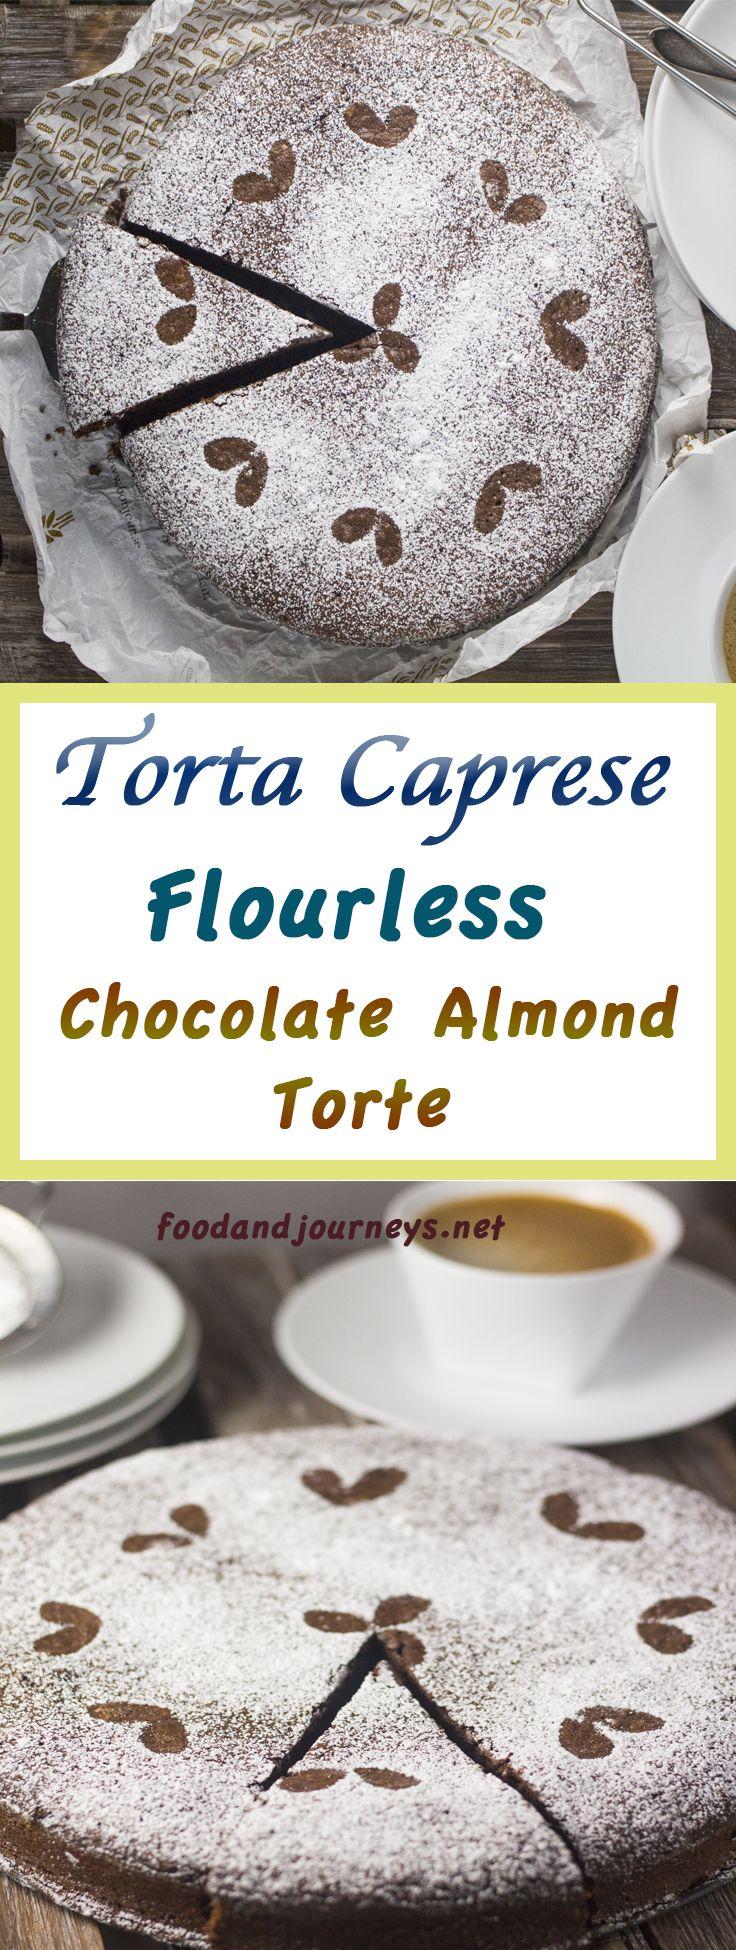 Torta Caprese (Chocolate Almond Torte). It's a flourless chocolate cake with almonds and rum; and it's Italian. Need I say more?  Italian | Recipe | Cake | Flourless. #cakerecipes #italianrecipes #dessertrecipes #authenticitalian #italianfood #chocolate #cake